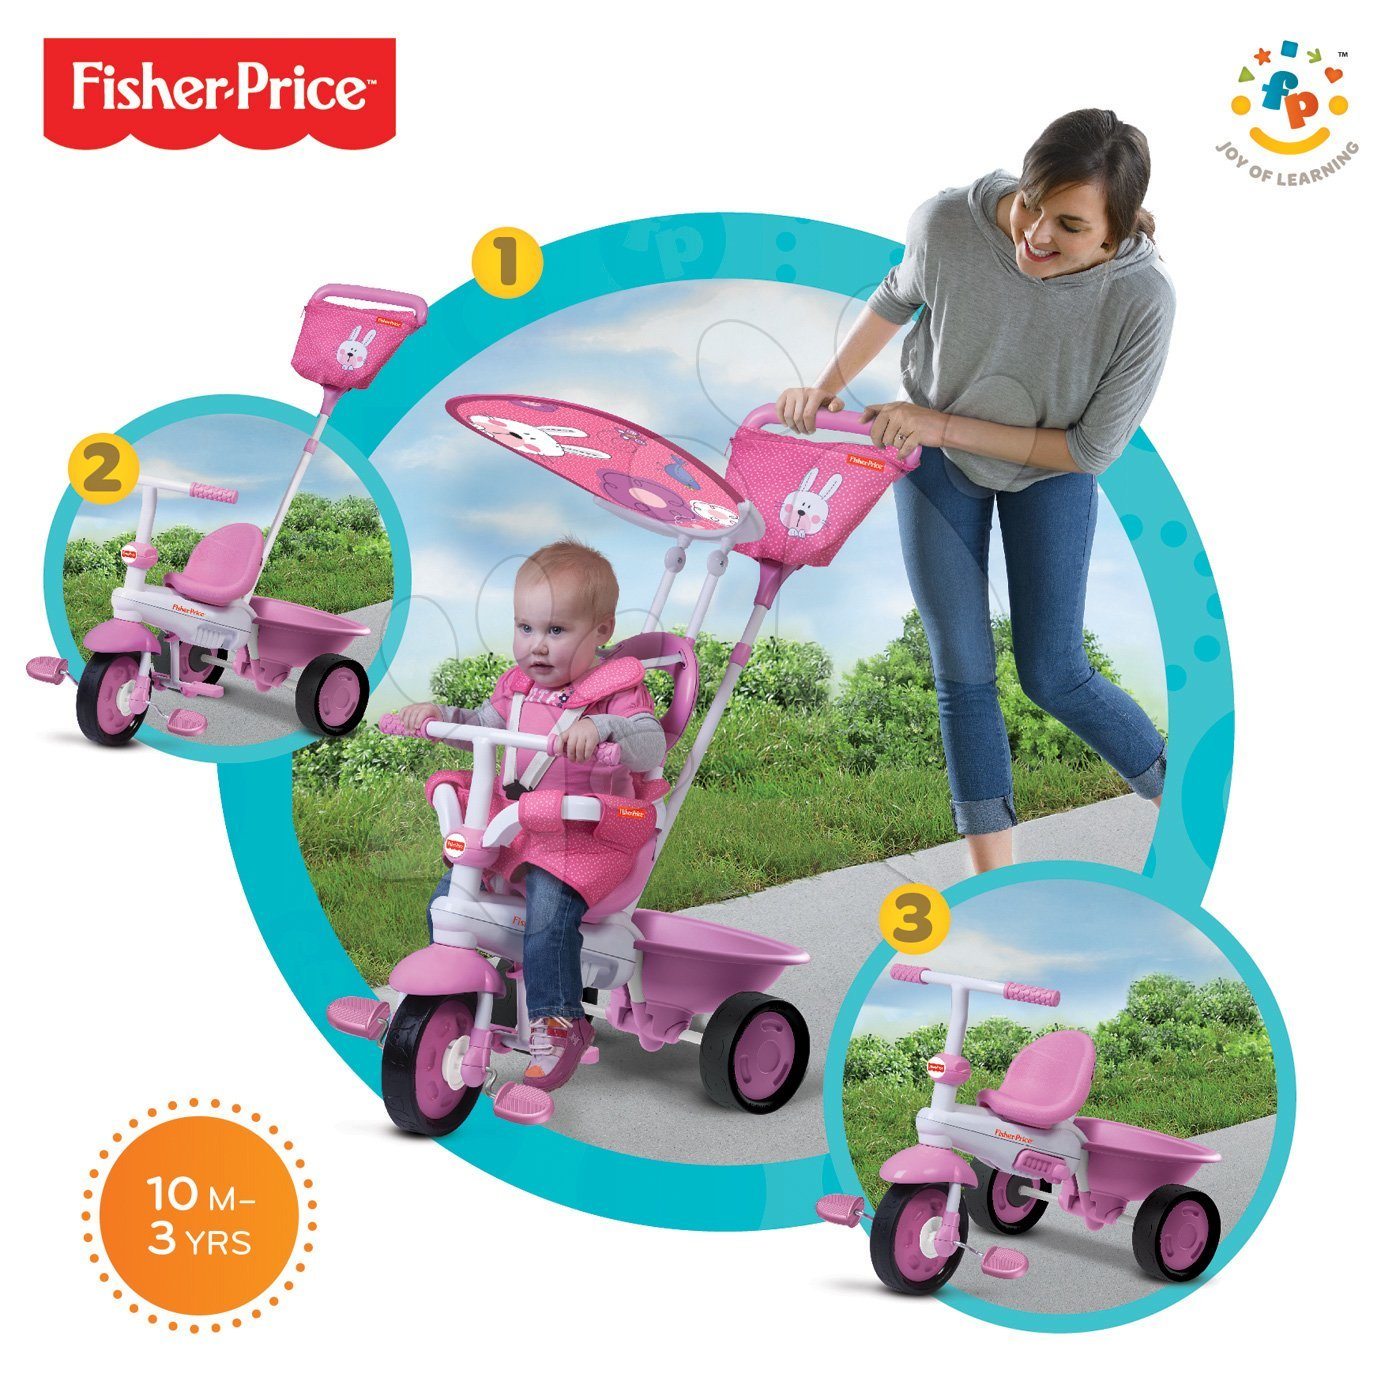 Trojkolky od 10 mesiacov - Trojkolka Elite Pink Fisher-Price ružová od 10 mes